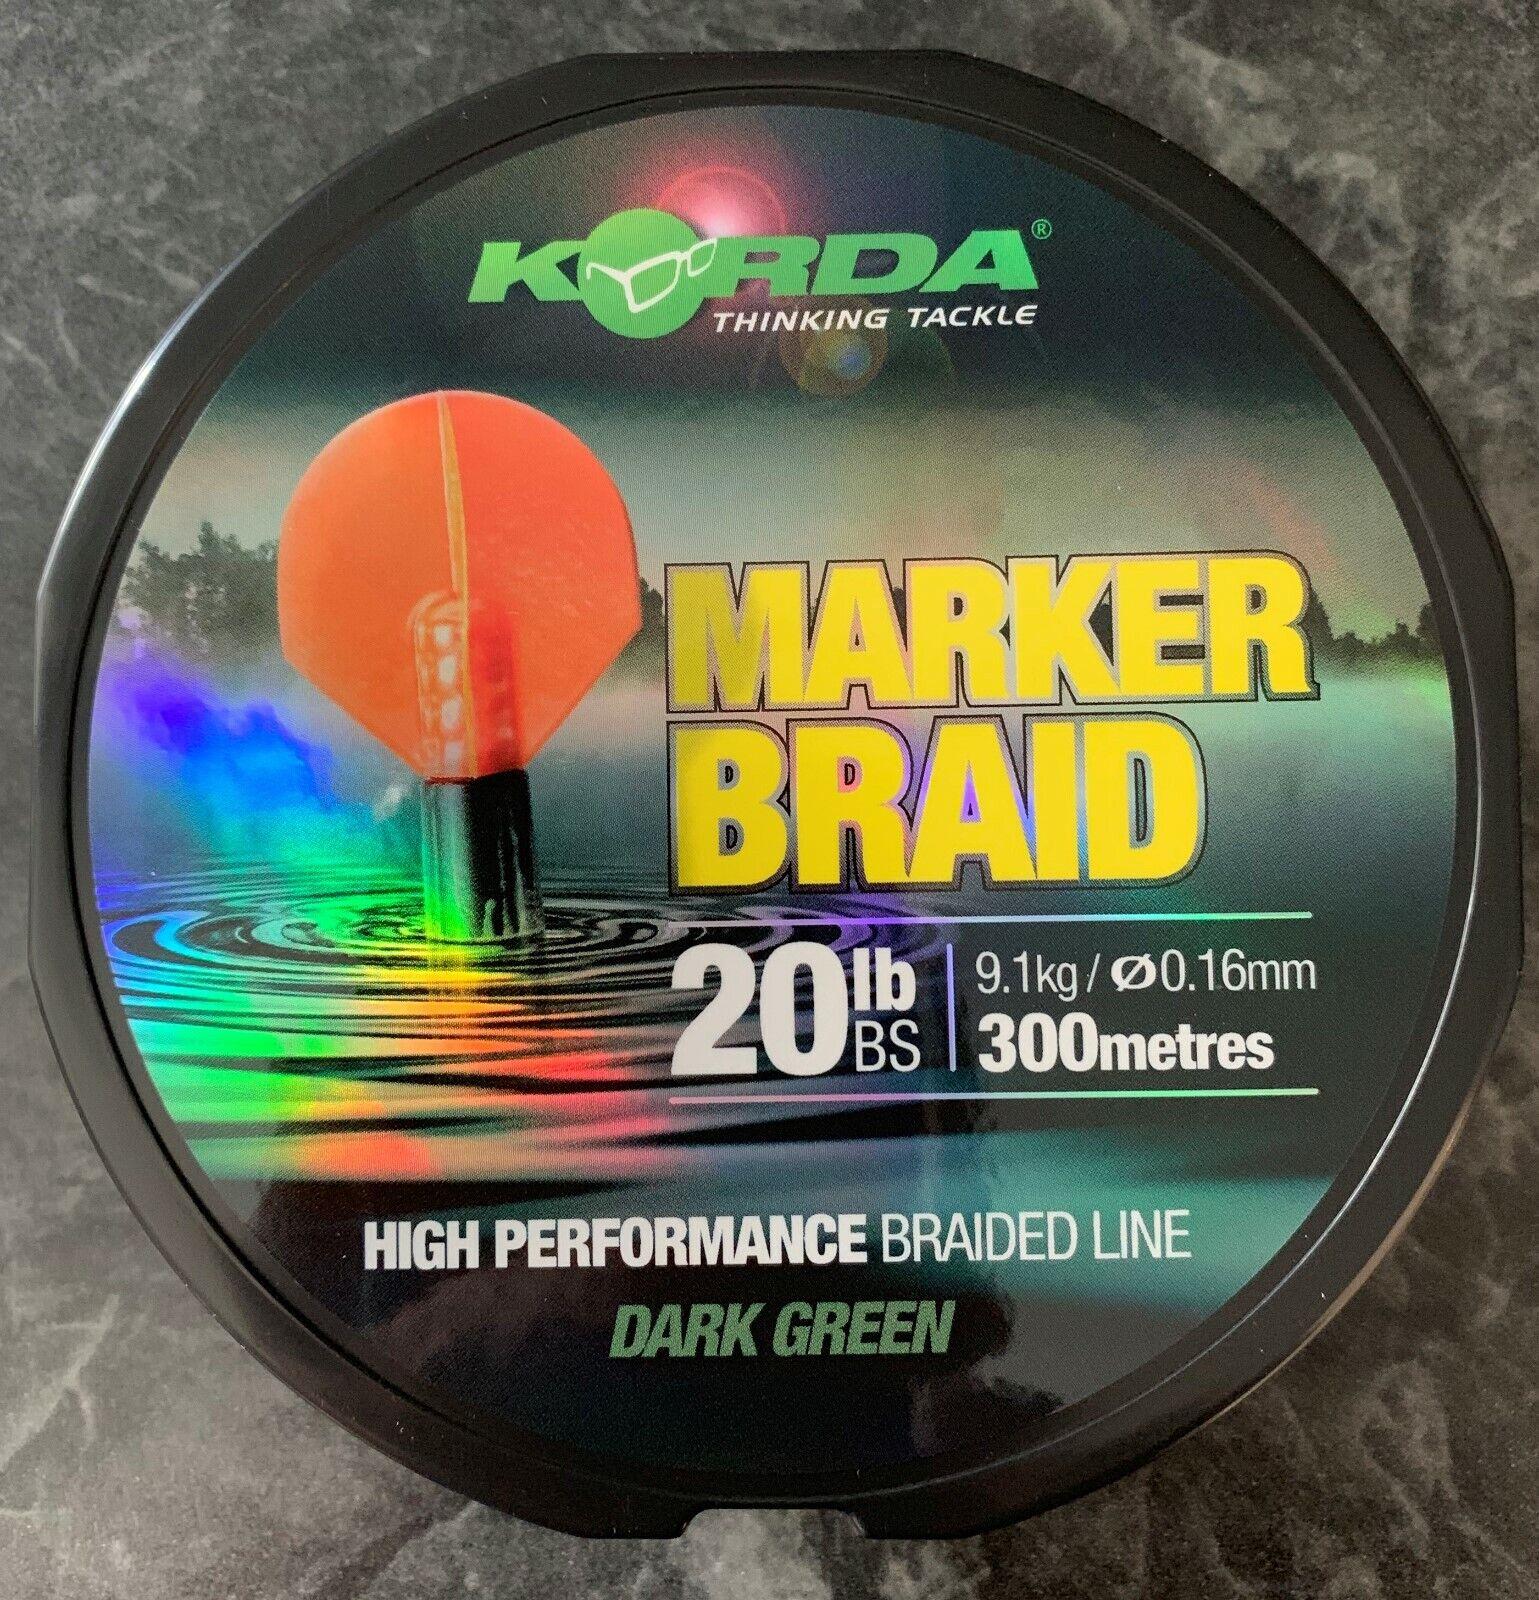 Korda Marker Braid  - 25lb - 300m  online shopping sports